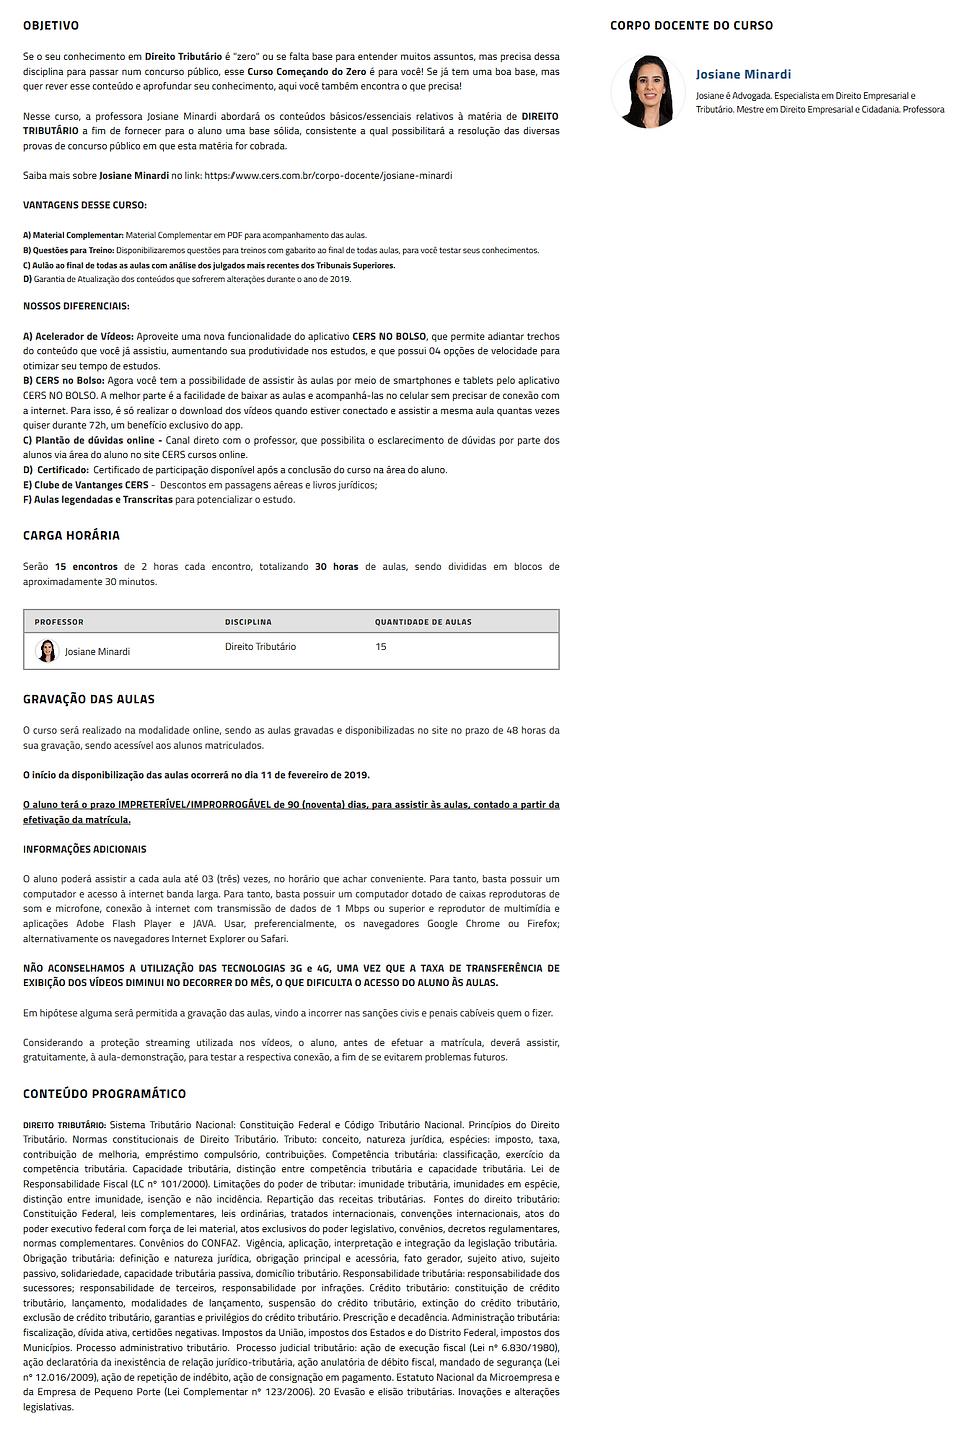 Direito Tributario CS(6).png